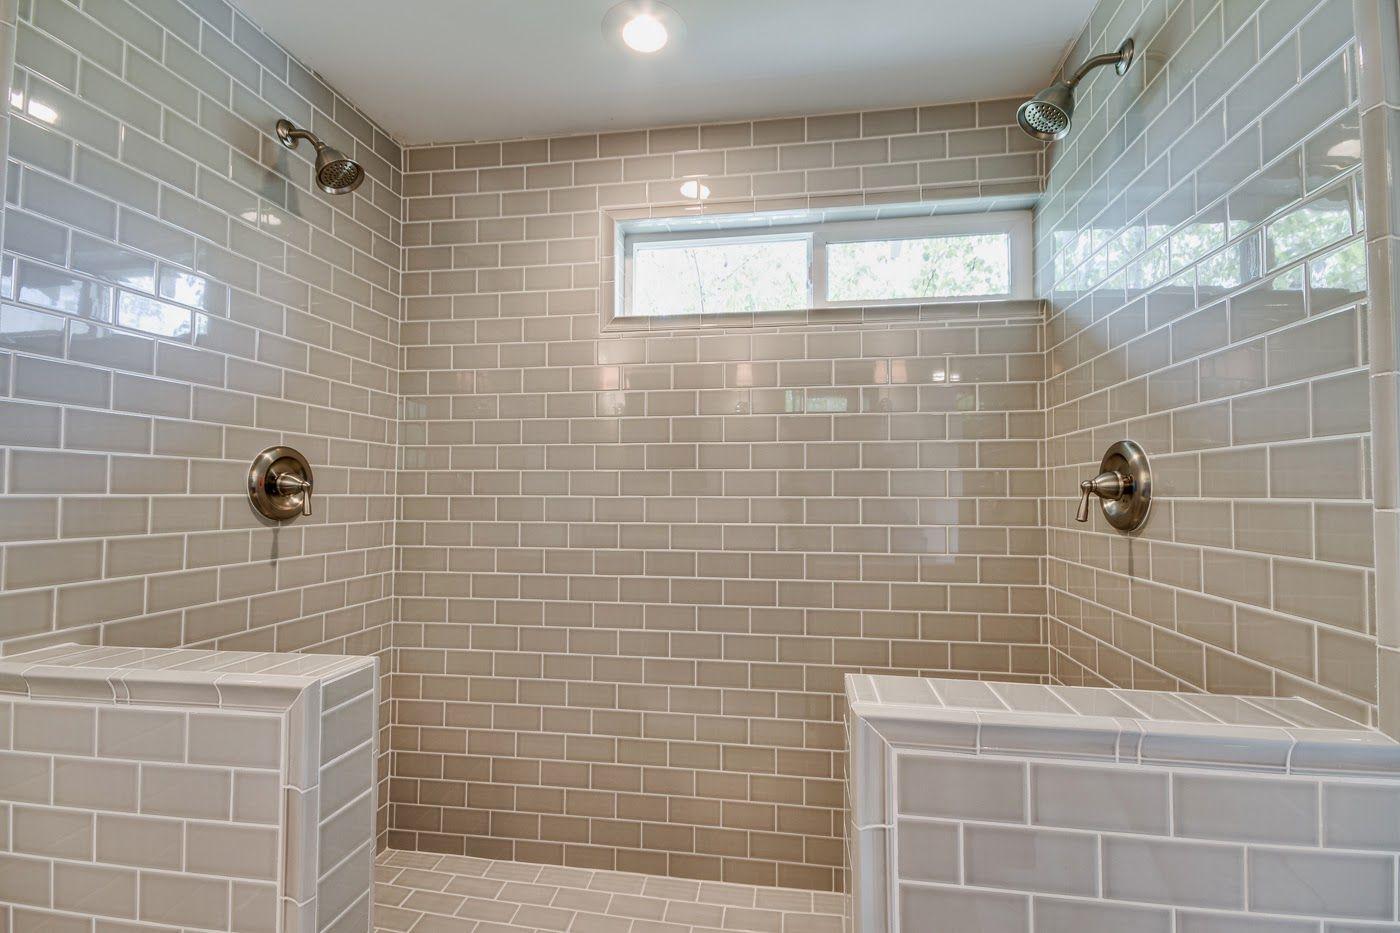 Bathroom Shower Wall Tile Classico Beige Porcelain Wall Tile Bathroom Shower Walls Bathroom Shower Tile Small Bathroom Tiles